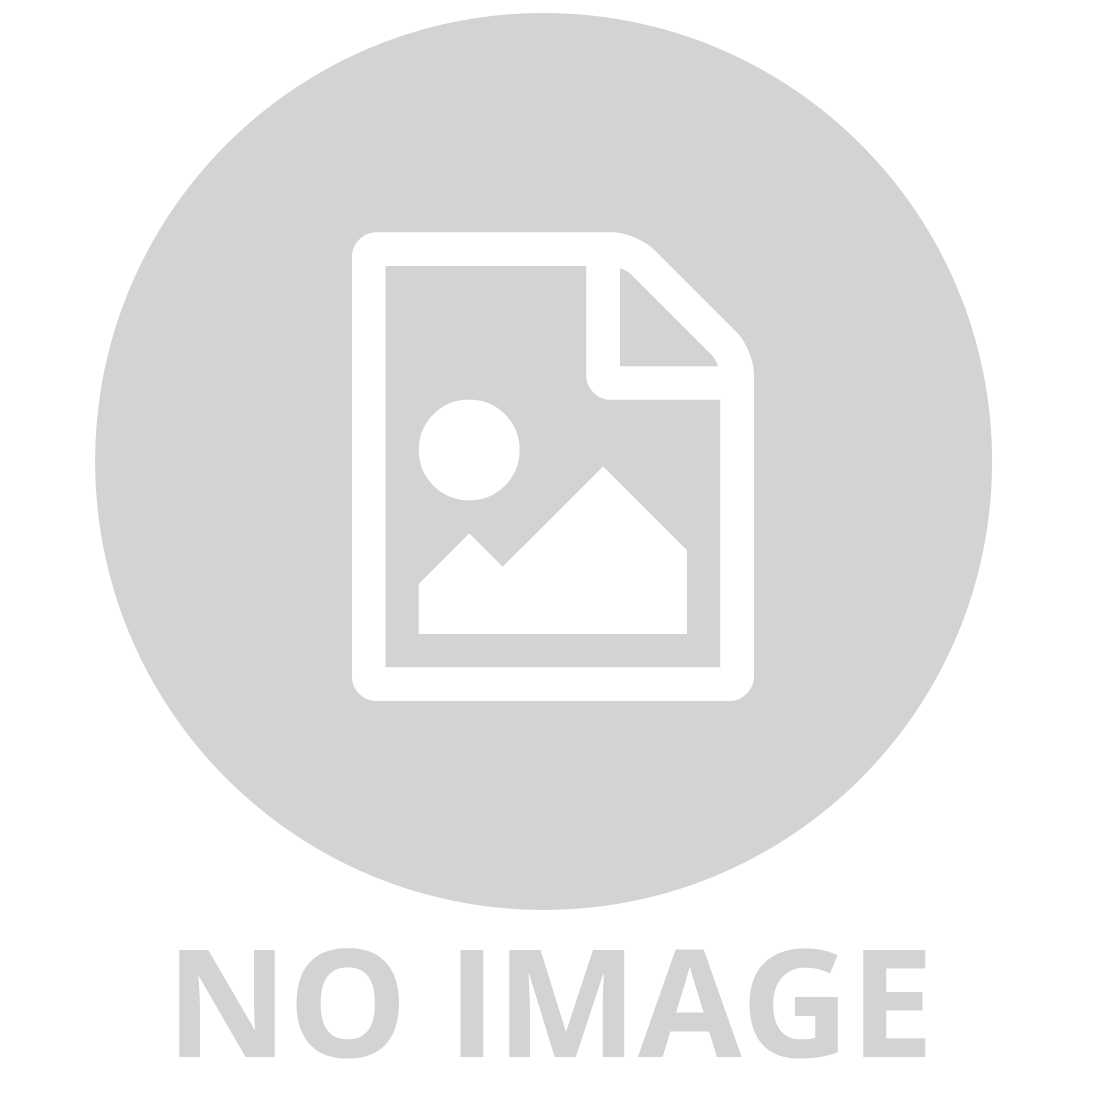 LEGO MINECRAFT- THE ICE SPIKES 21131